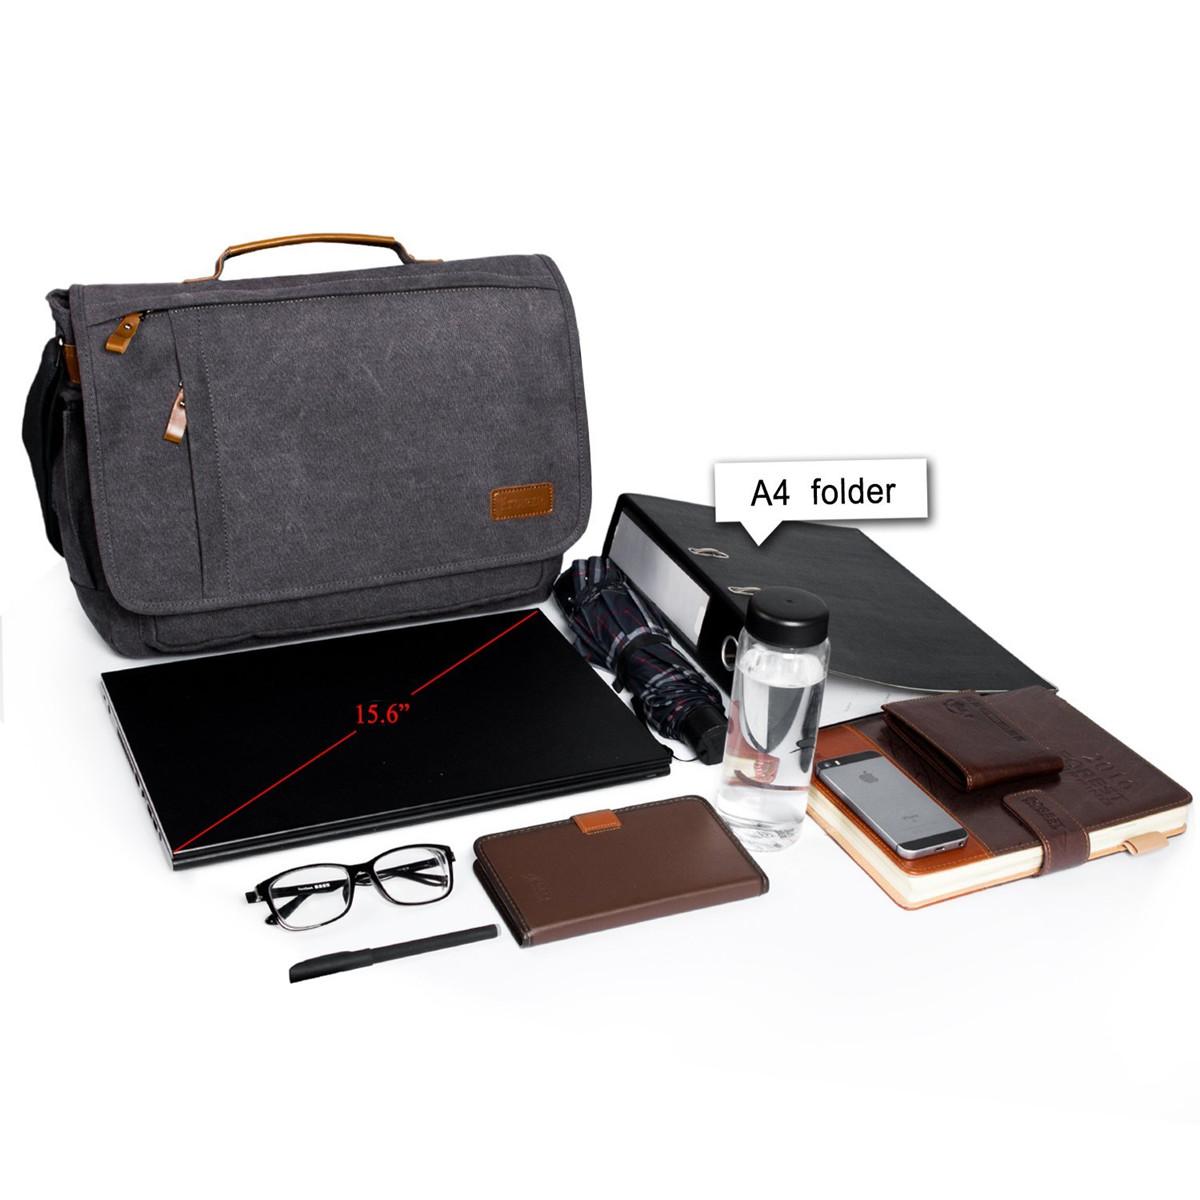 Gracosy Men Women Vintage Canvas Laptop Bag Shoulder Bag 15.6 Inch